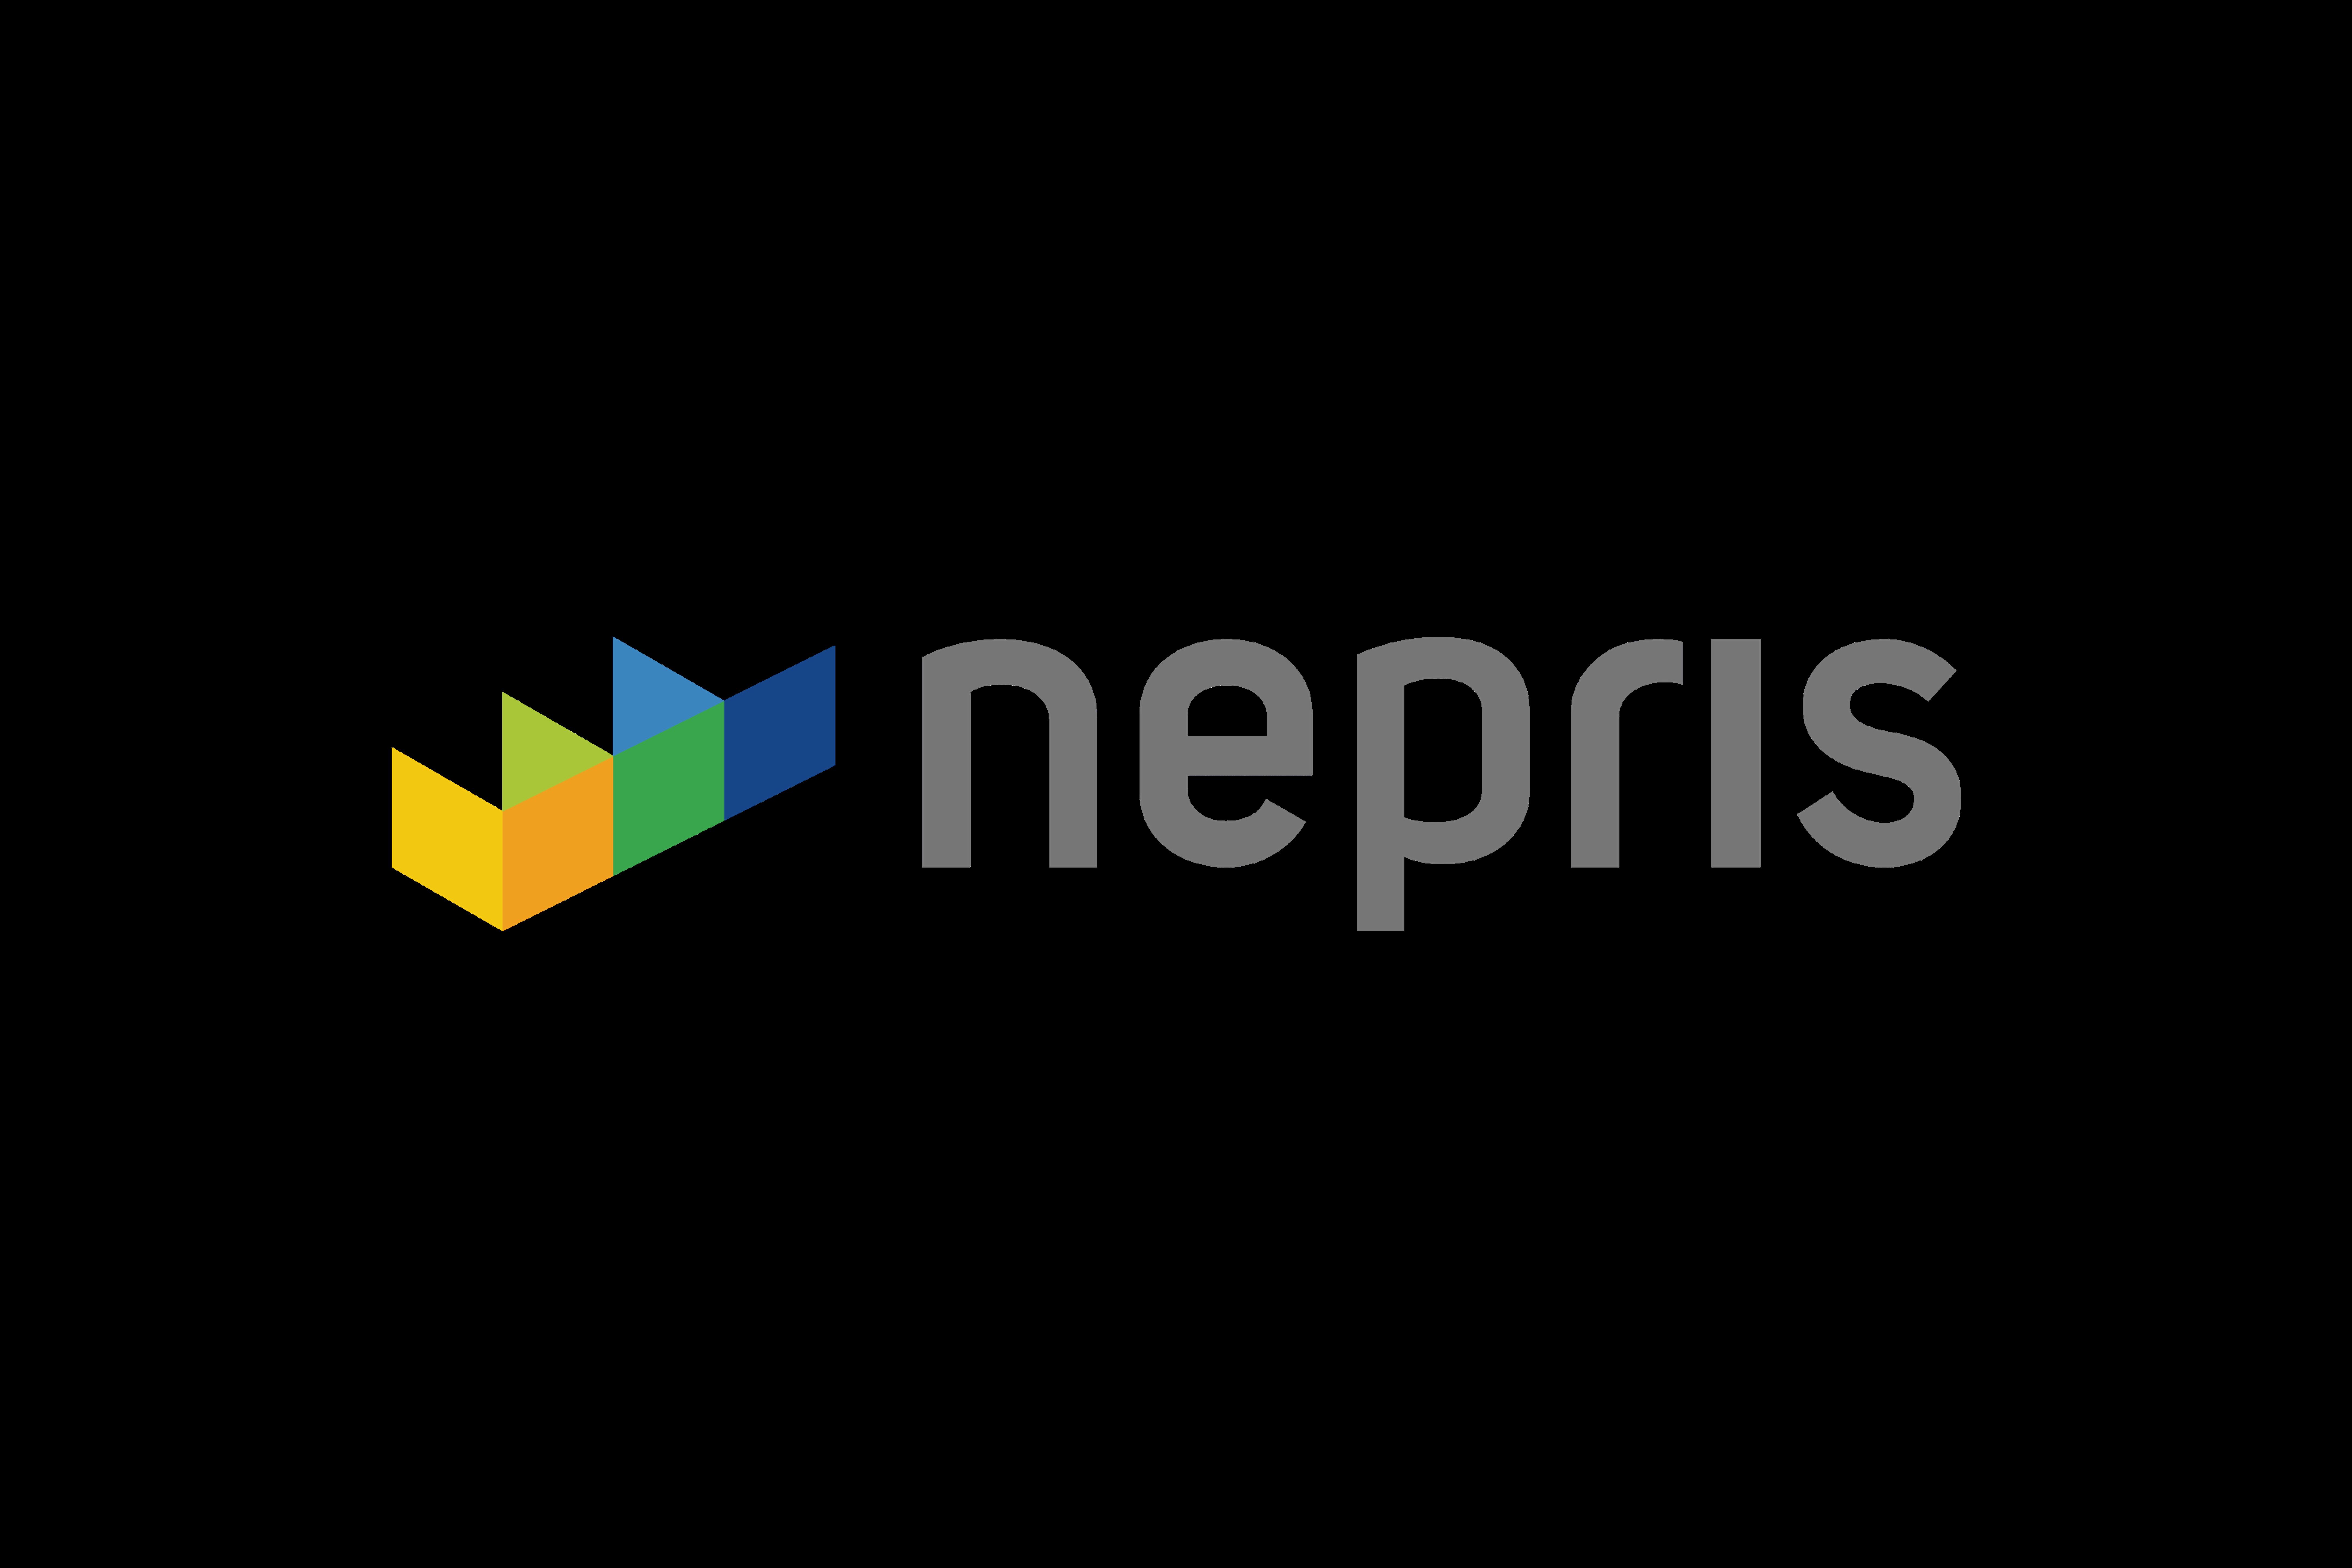 Nepris, Inc. logo